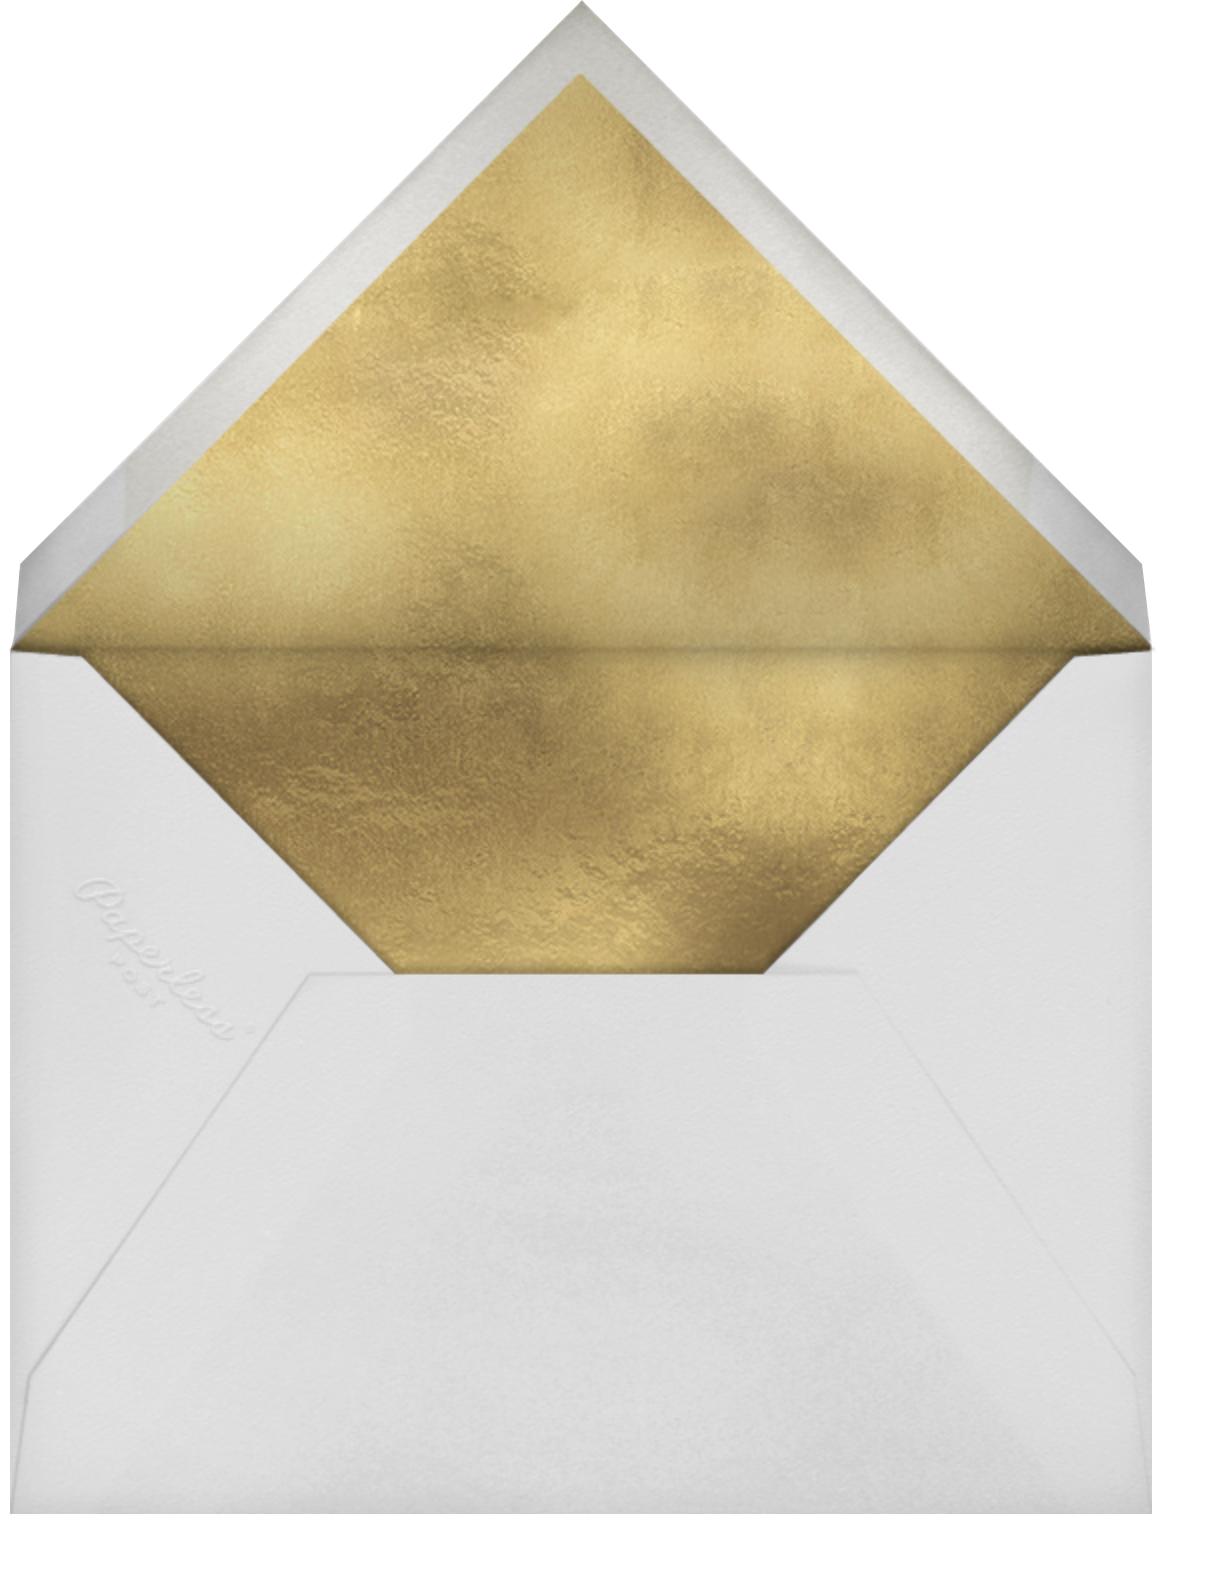 Grand Grad - Paperless Post - Graduation party - envelope back